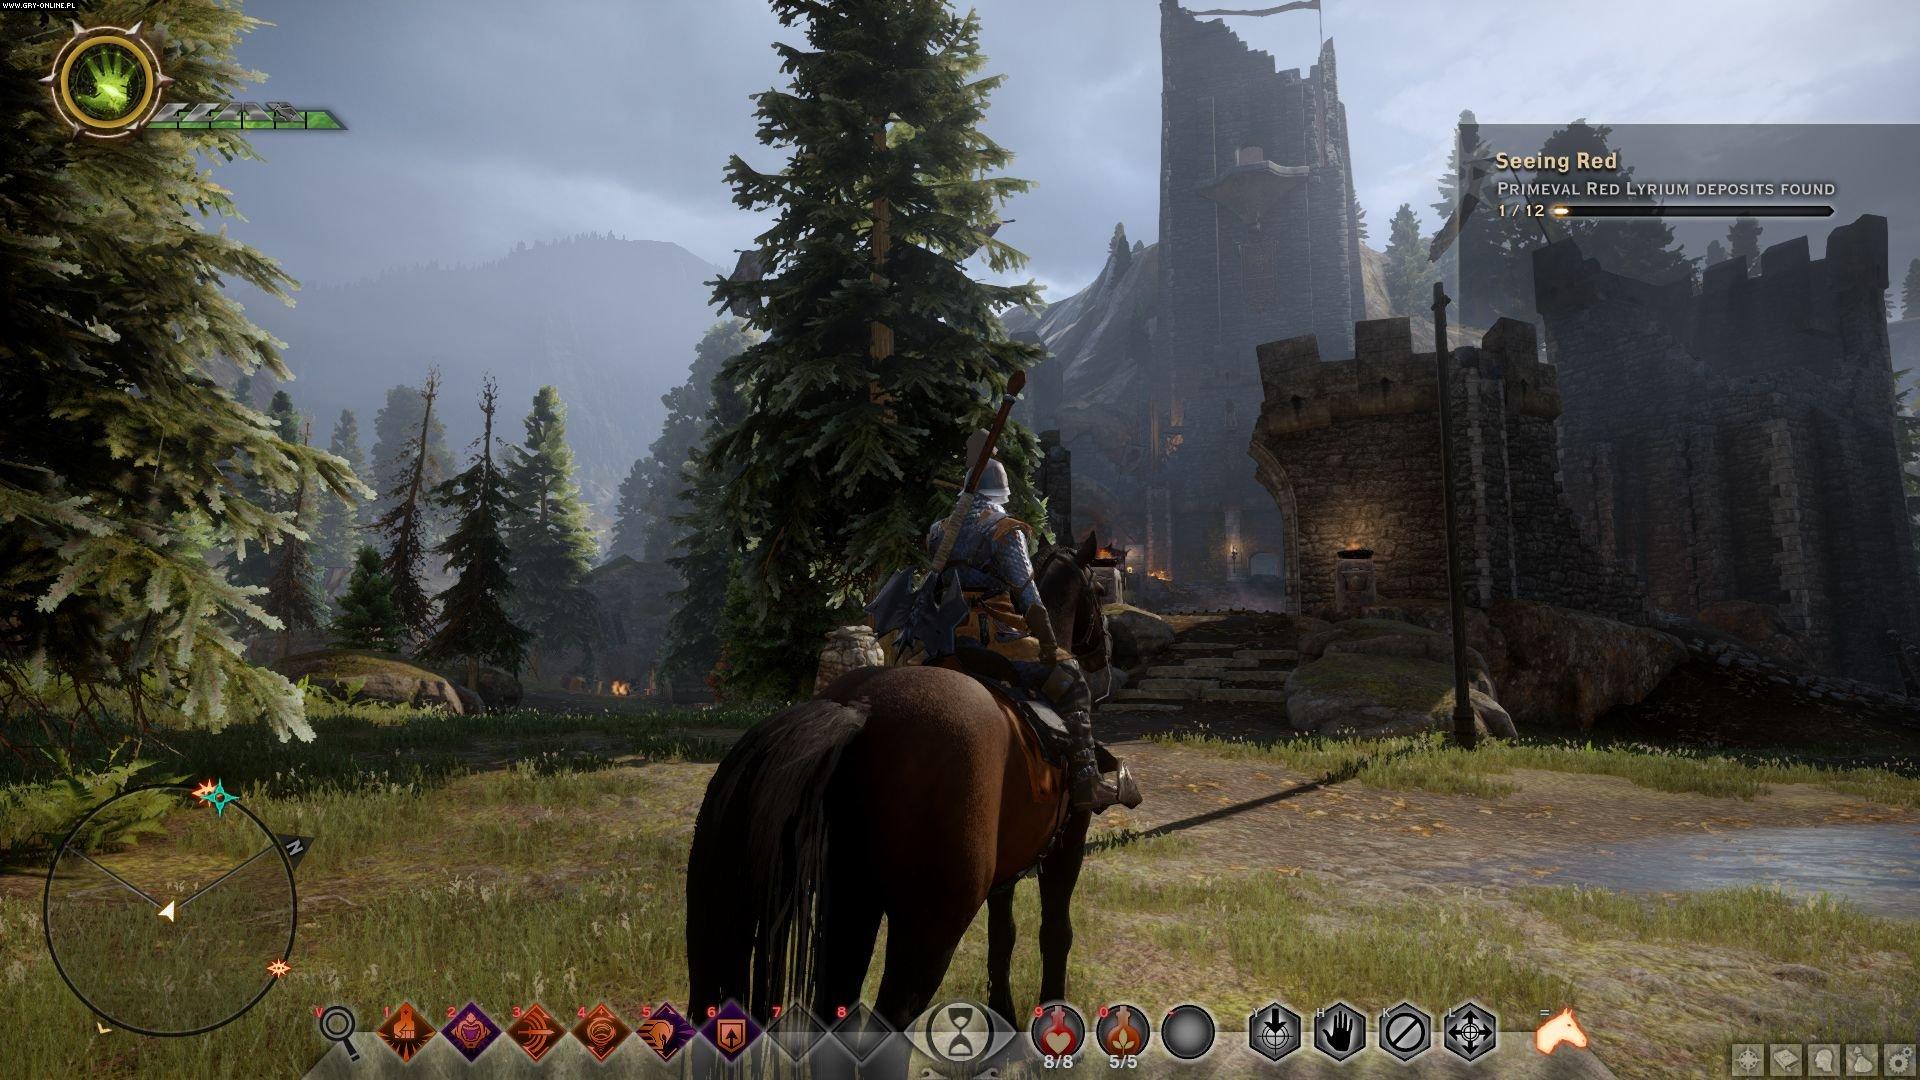 Dragon Age: Inquisition PC, X360, PS3 Games Image 8/225, BioWare Corporation, Electronic Arts Inc.